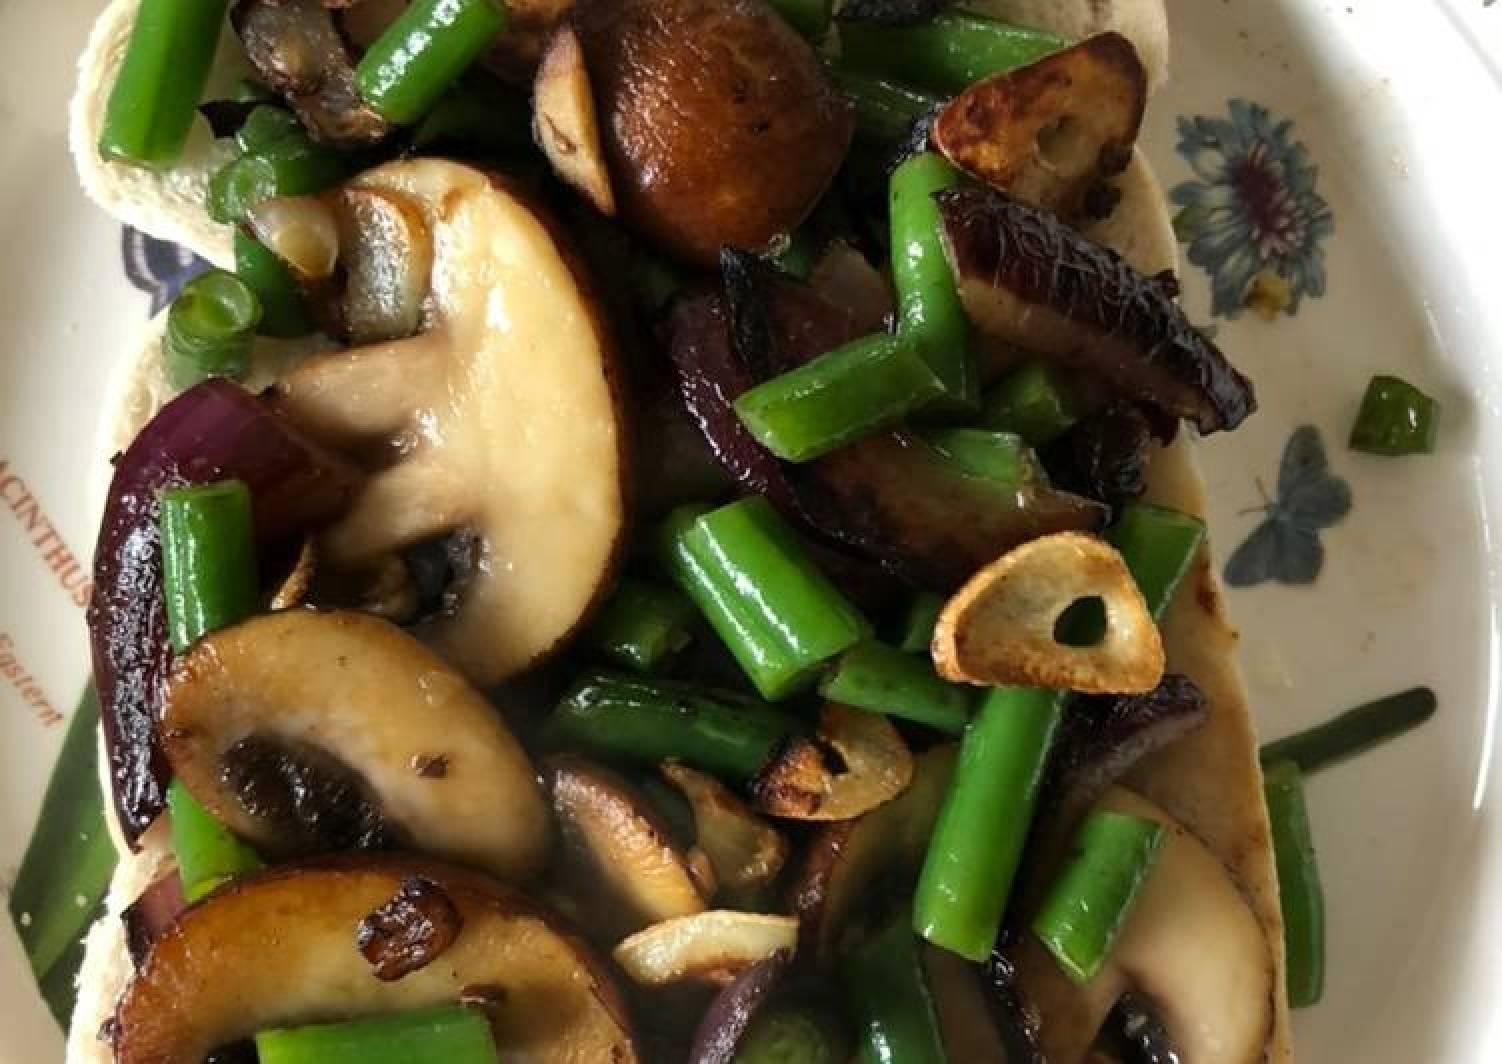 Sautéed French Bean & Mushroom Sandwich